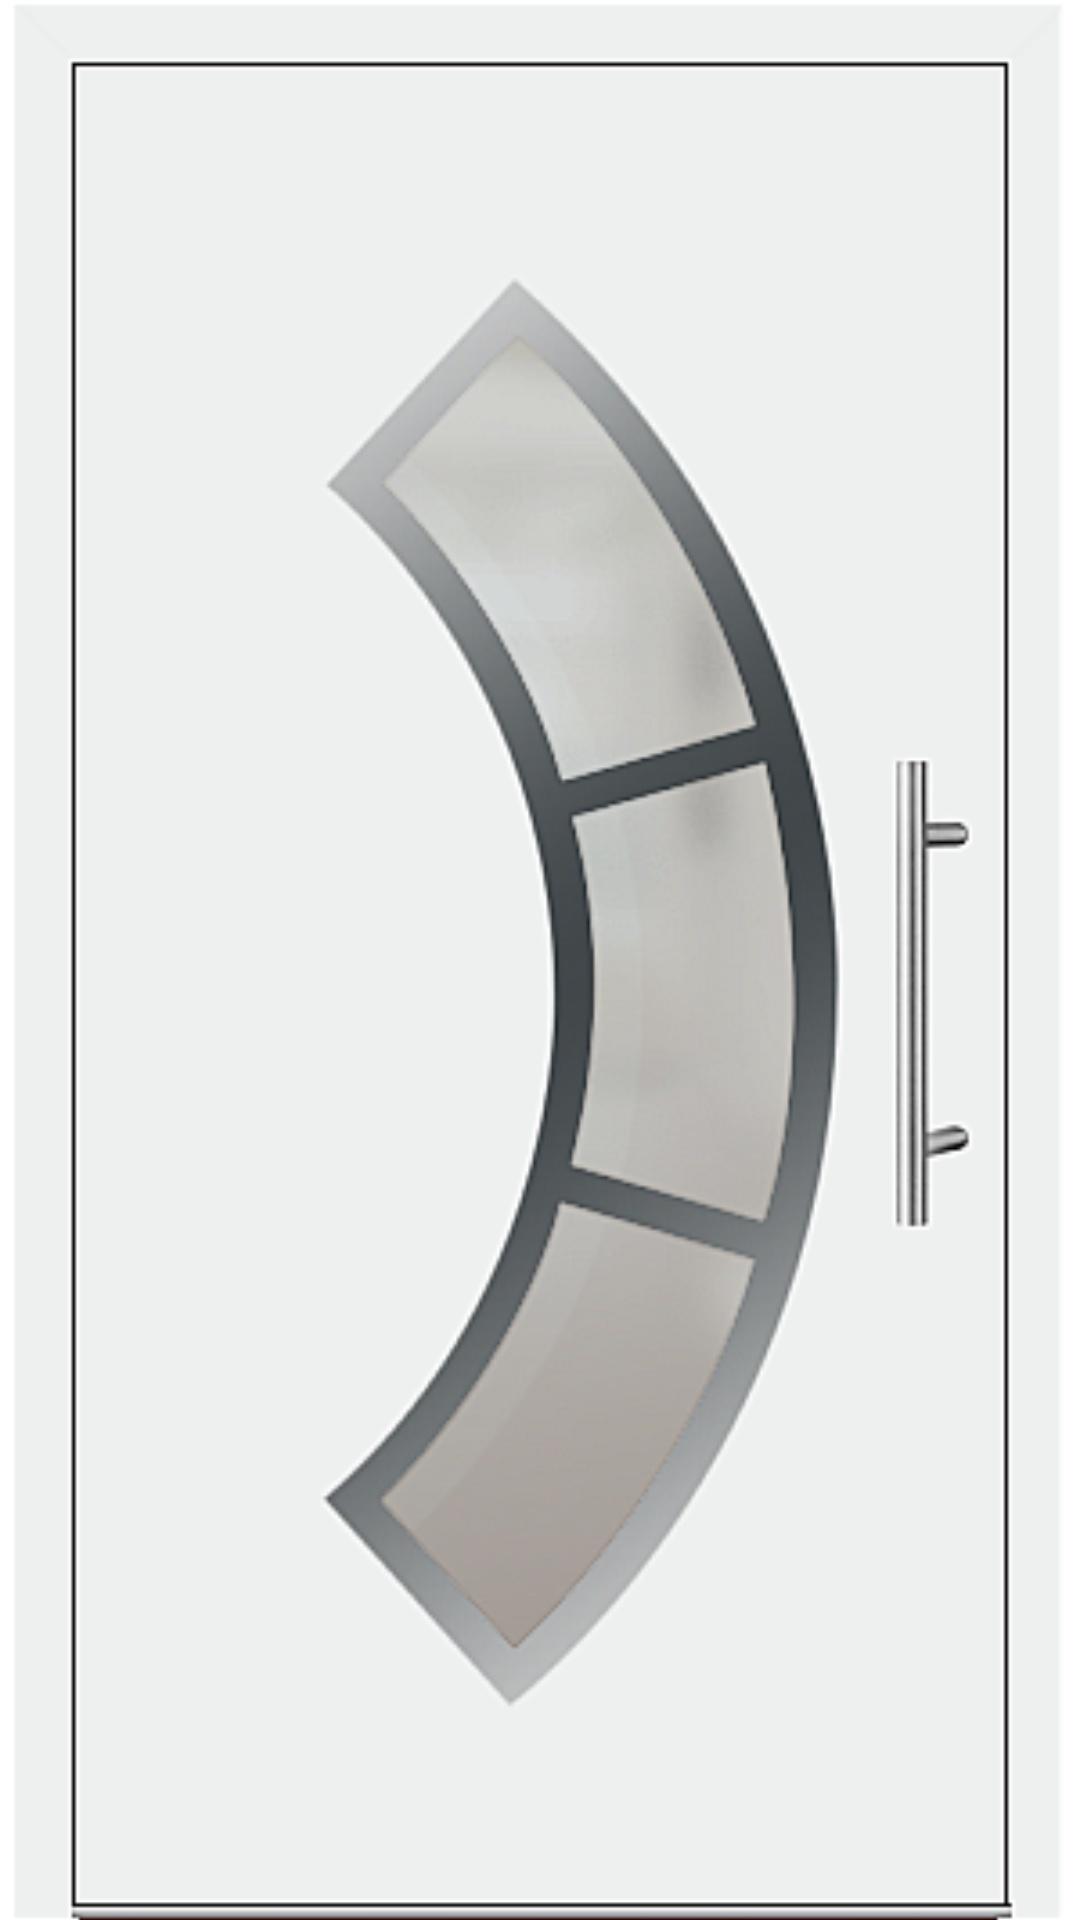 Aluminium Haustür Modell 6440-75 weiß